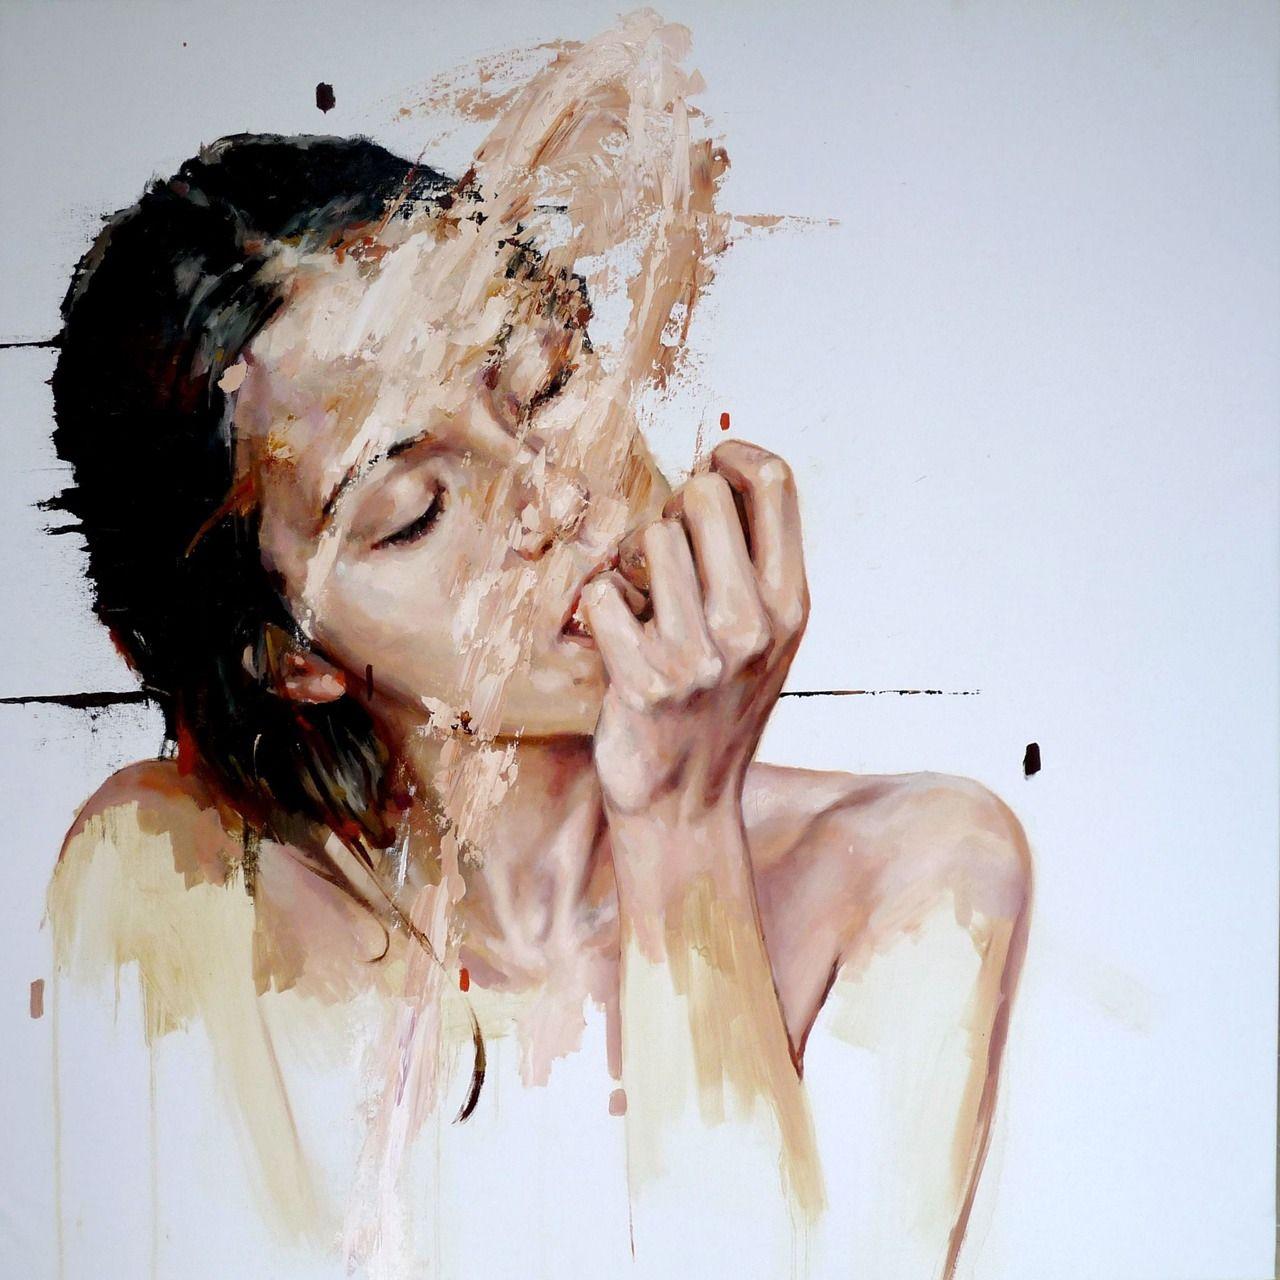 Cesar Biojo - More artists around the world in : http://www.maslindo.com #art #artists #maslindo